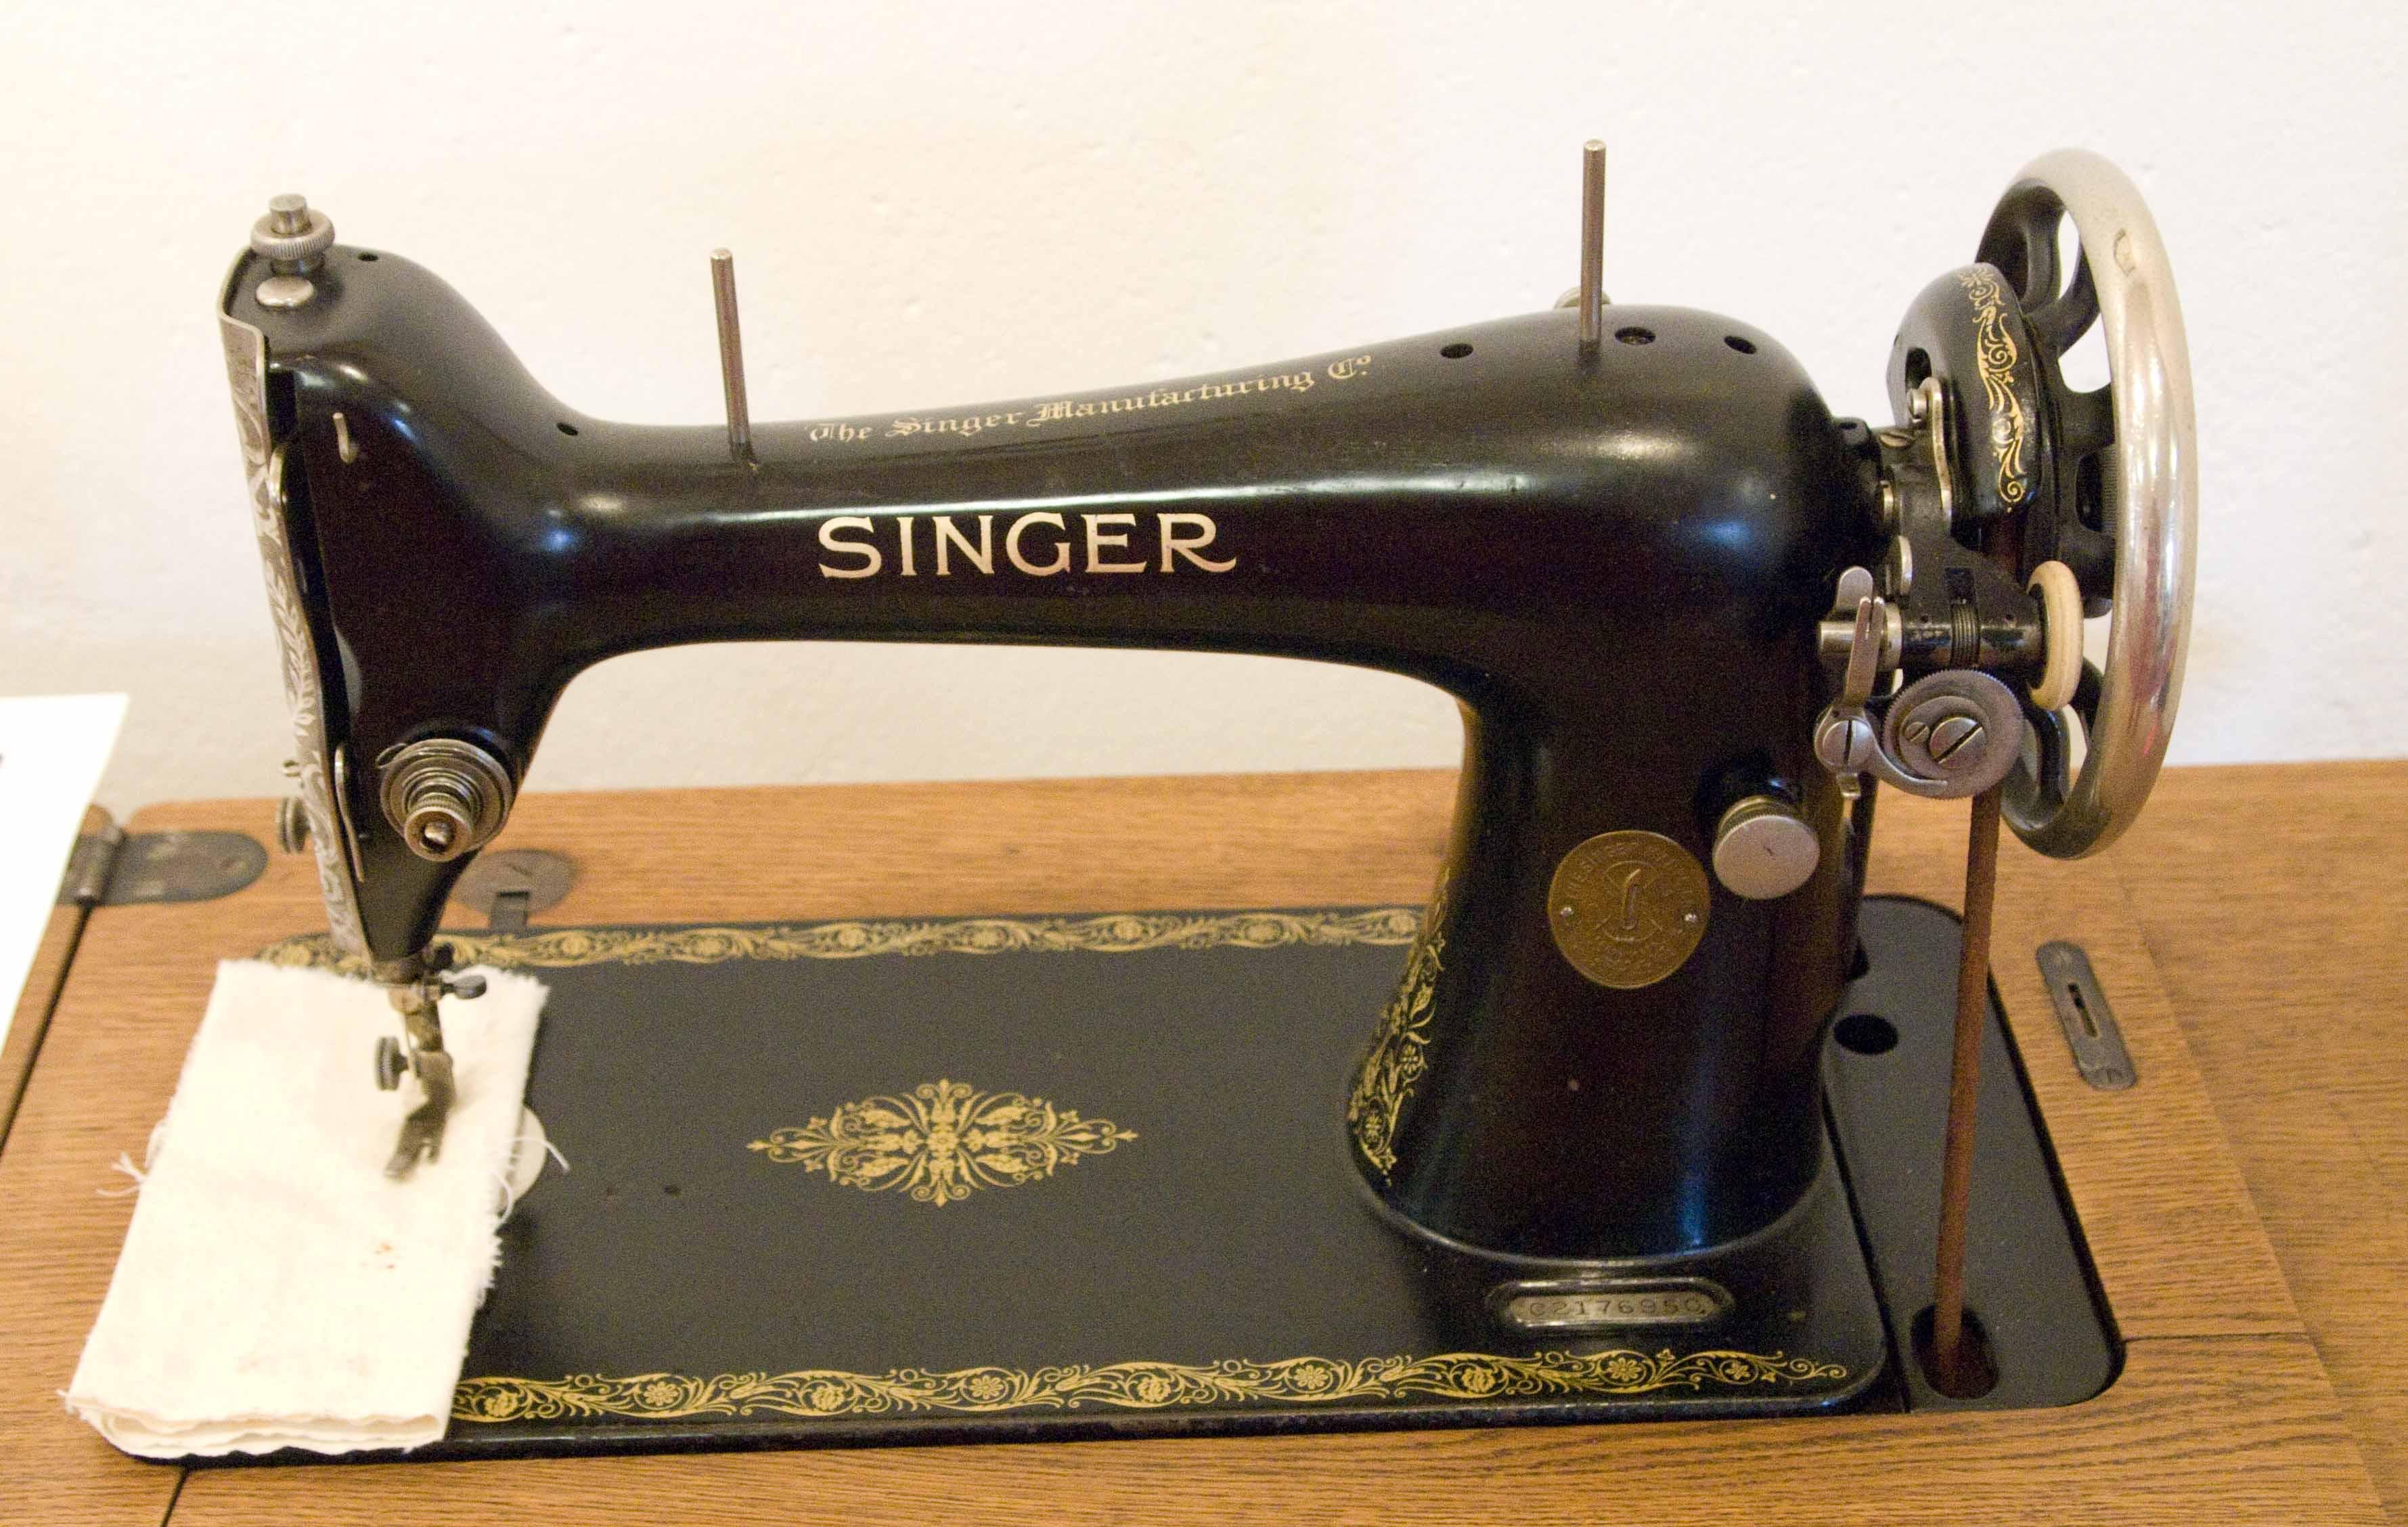 gamle singer symaskiner priser